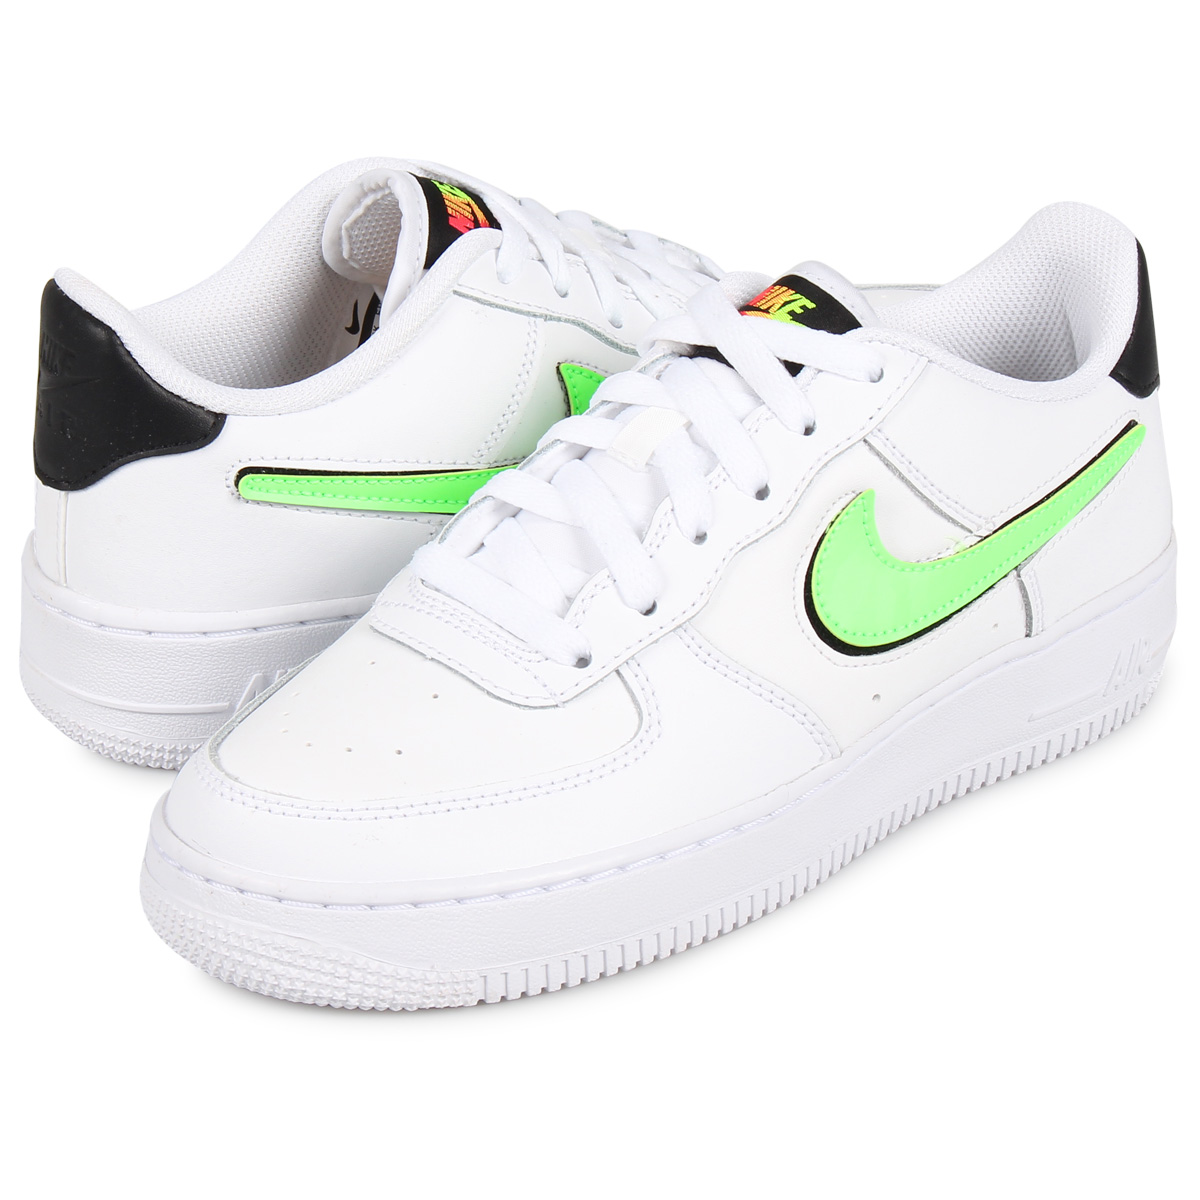 Nike Air Force 1 LV8 1 GS Schuhe Sneaker Freizeit Turnschuhe